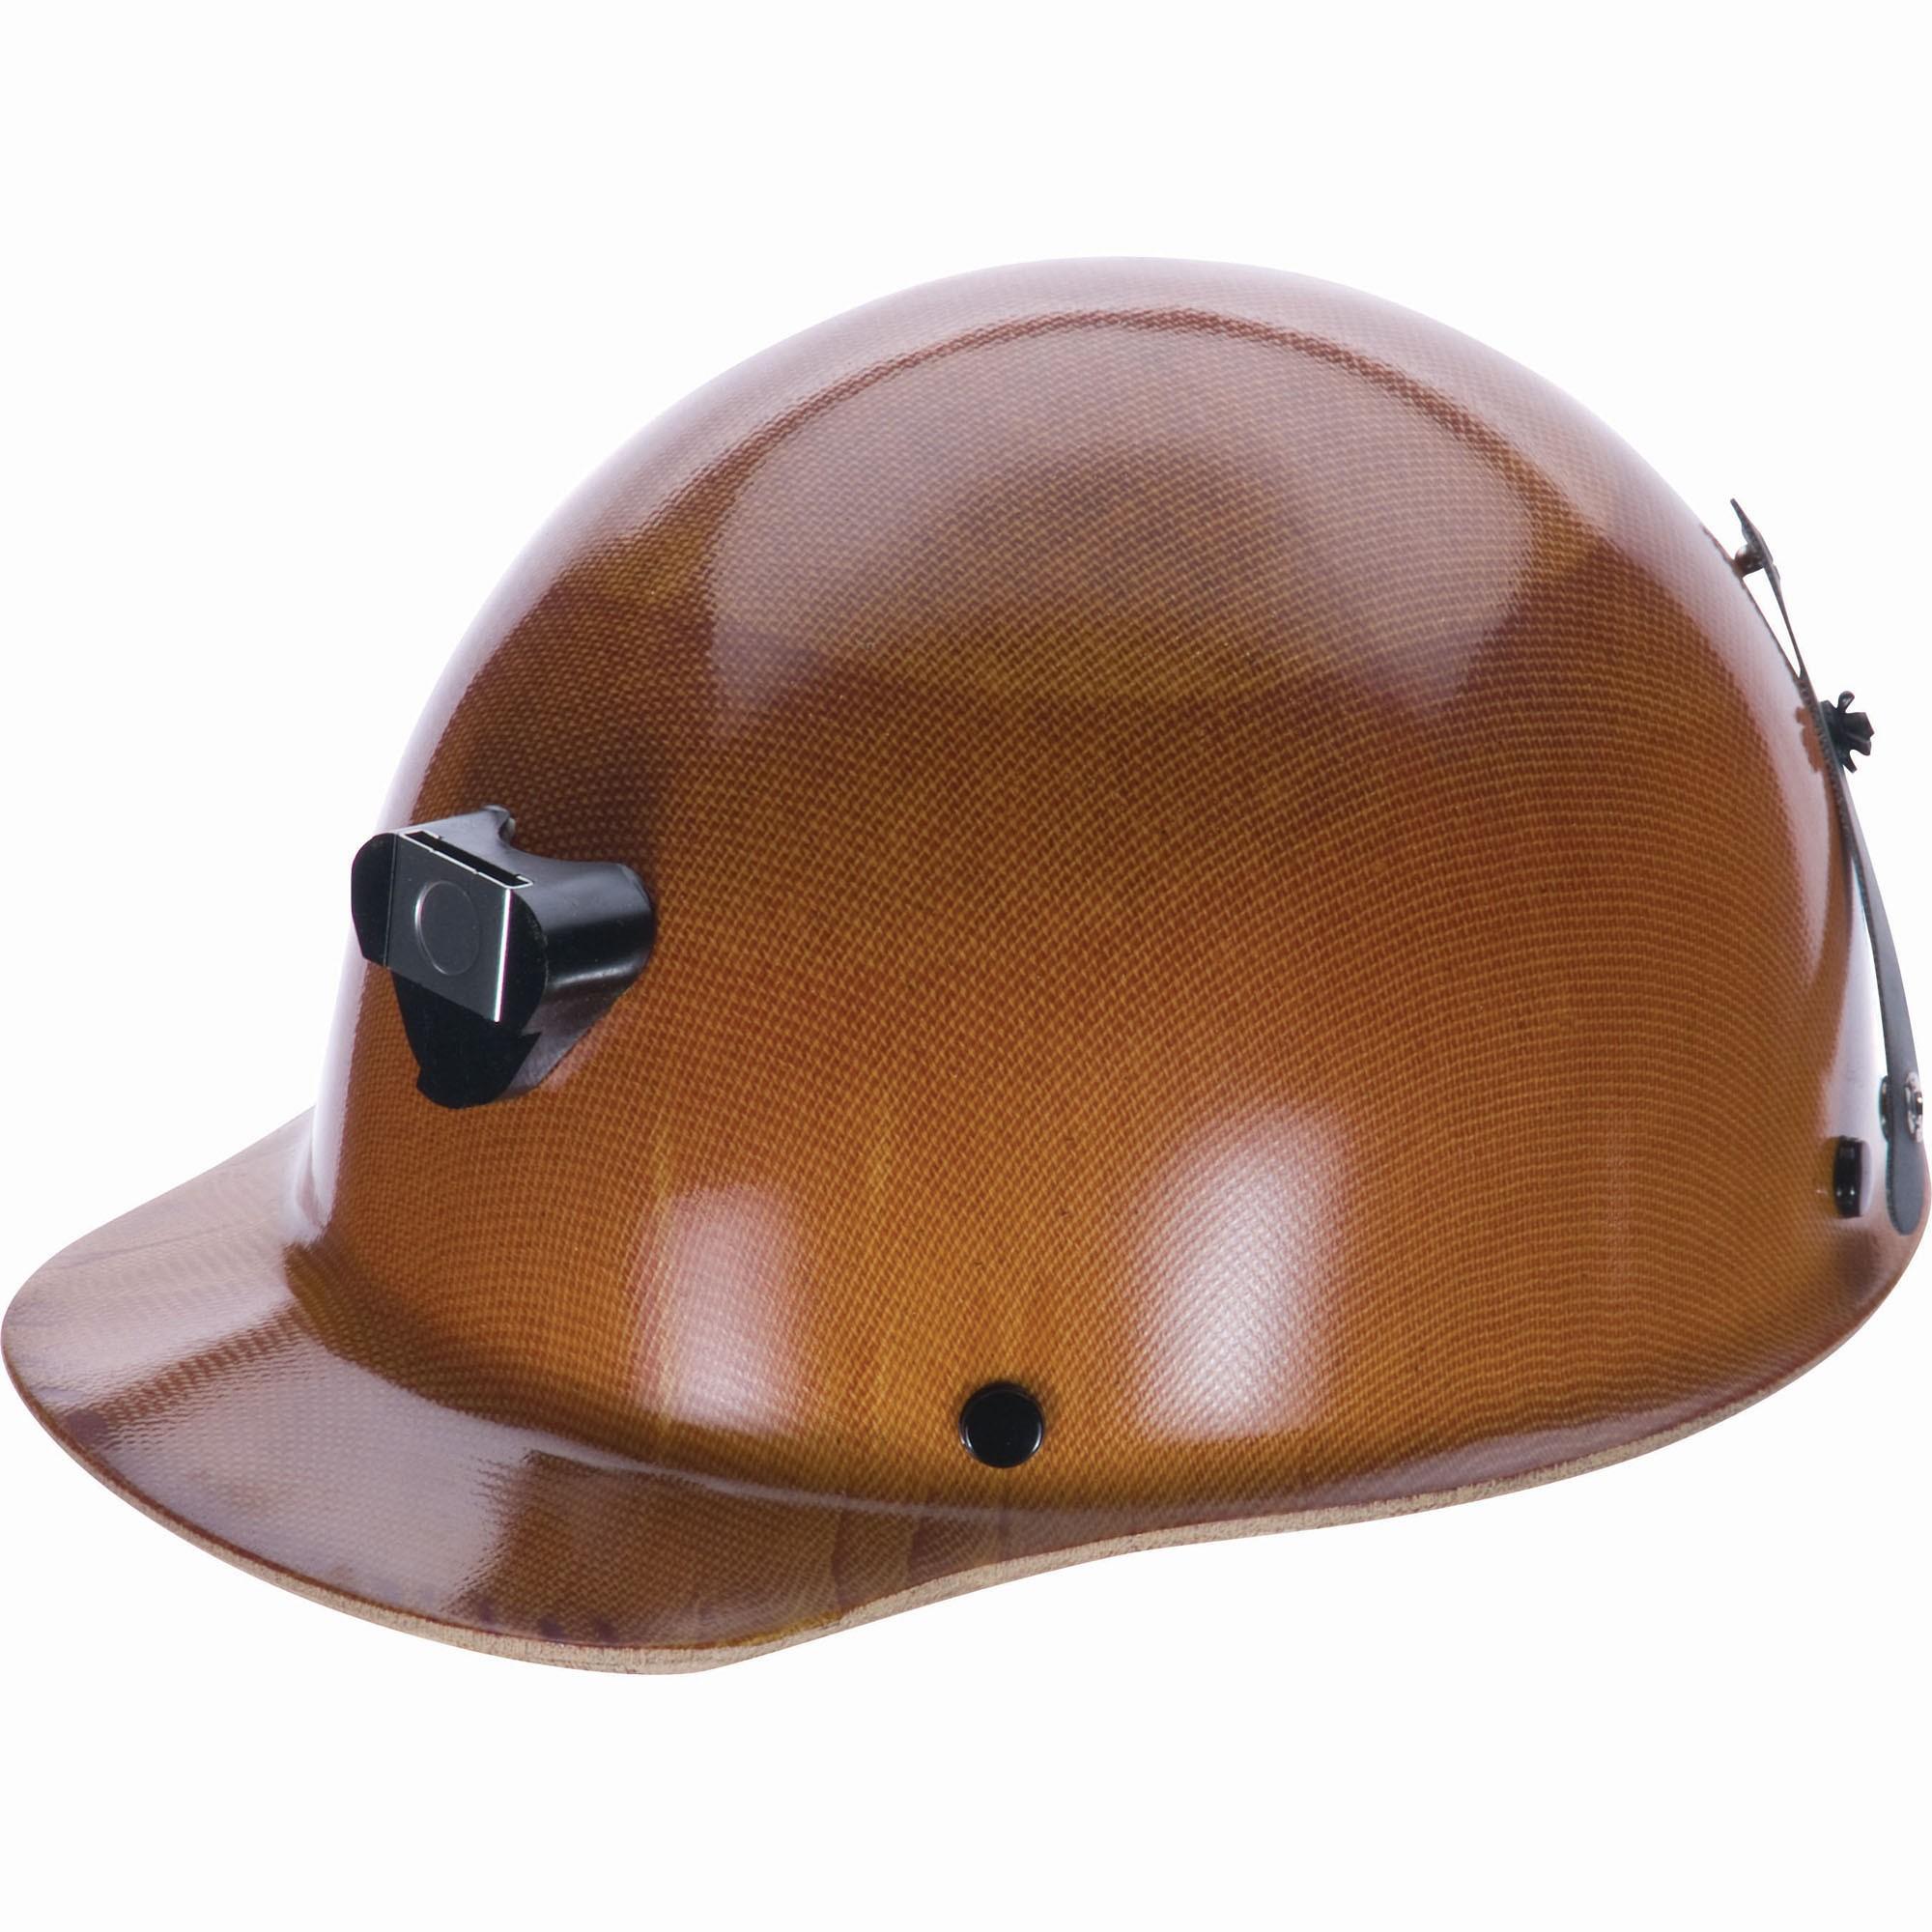 Msa 460409 Skullgard Cap Style Hard Hat W Lamp Bracket